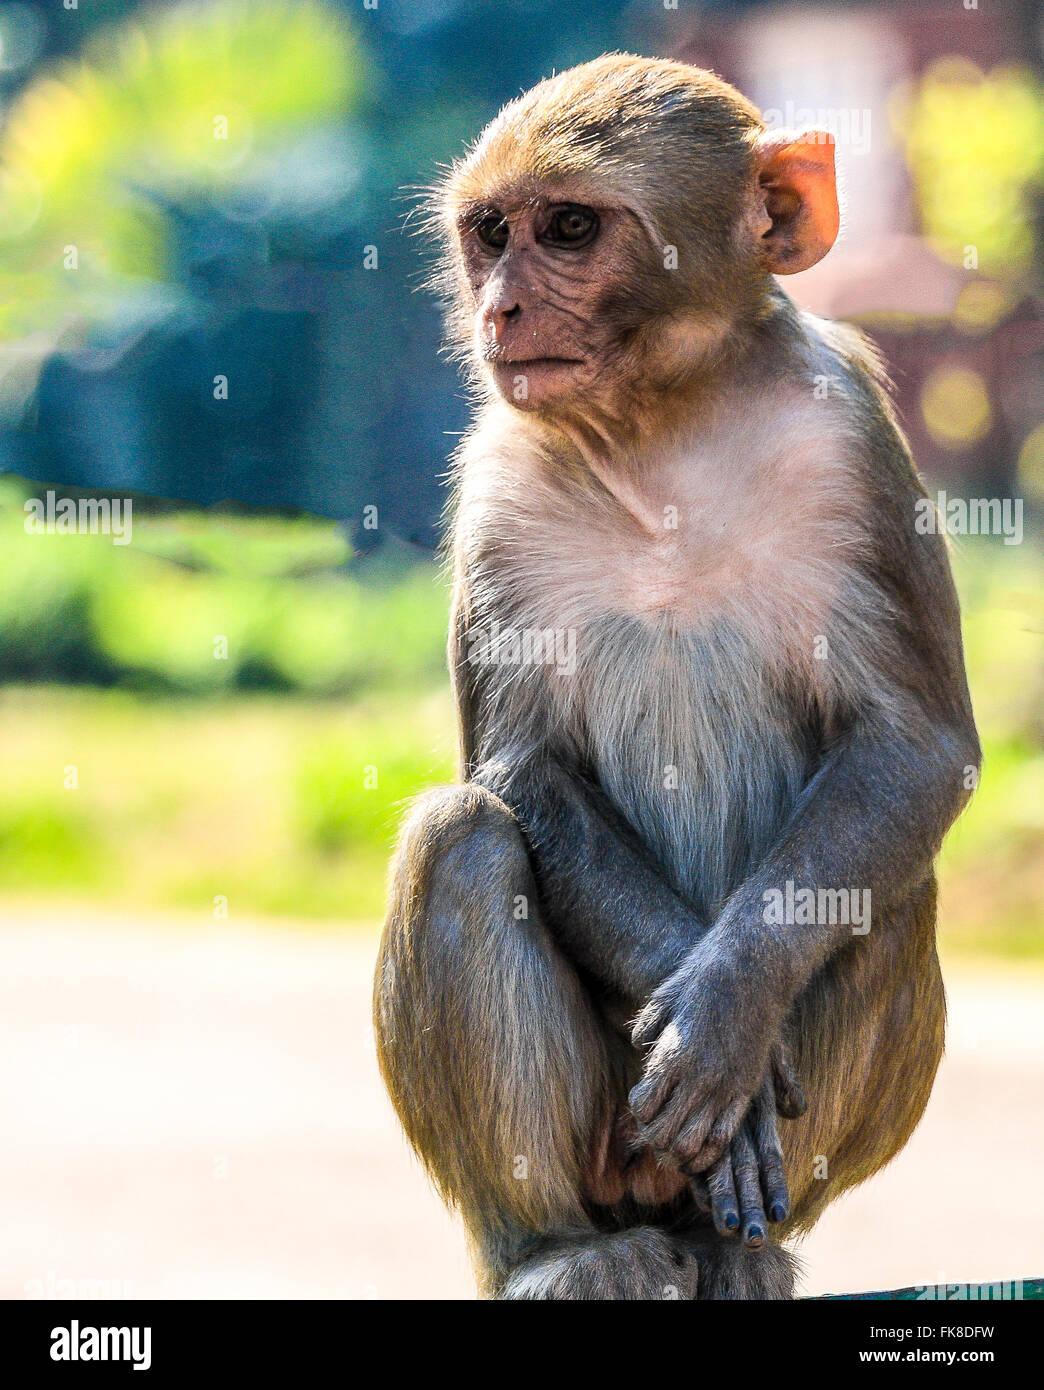 Young Rhesus Macaque monkey playing - Stock Image